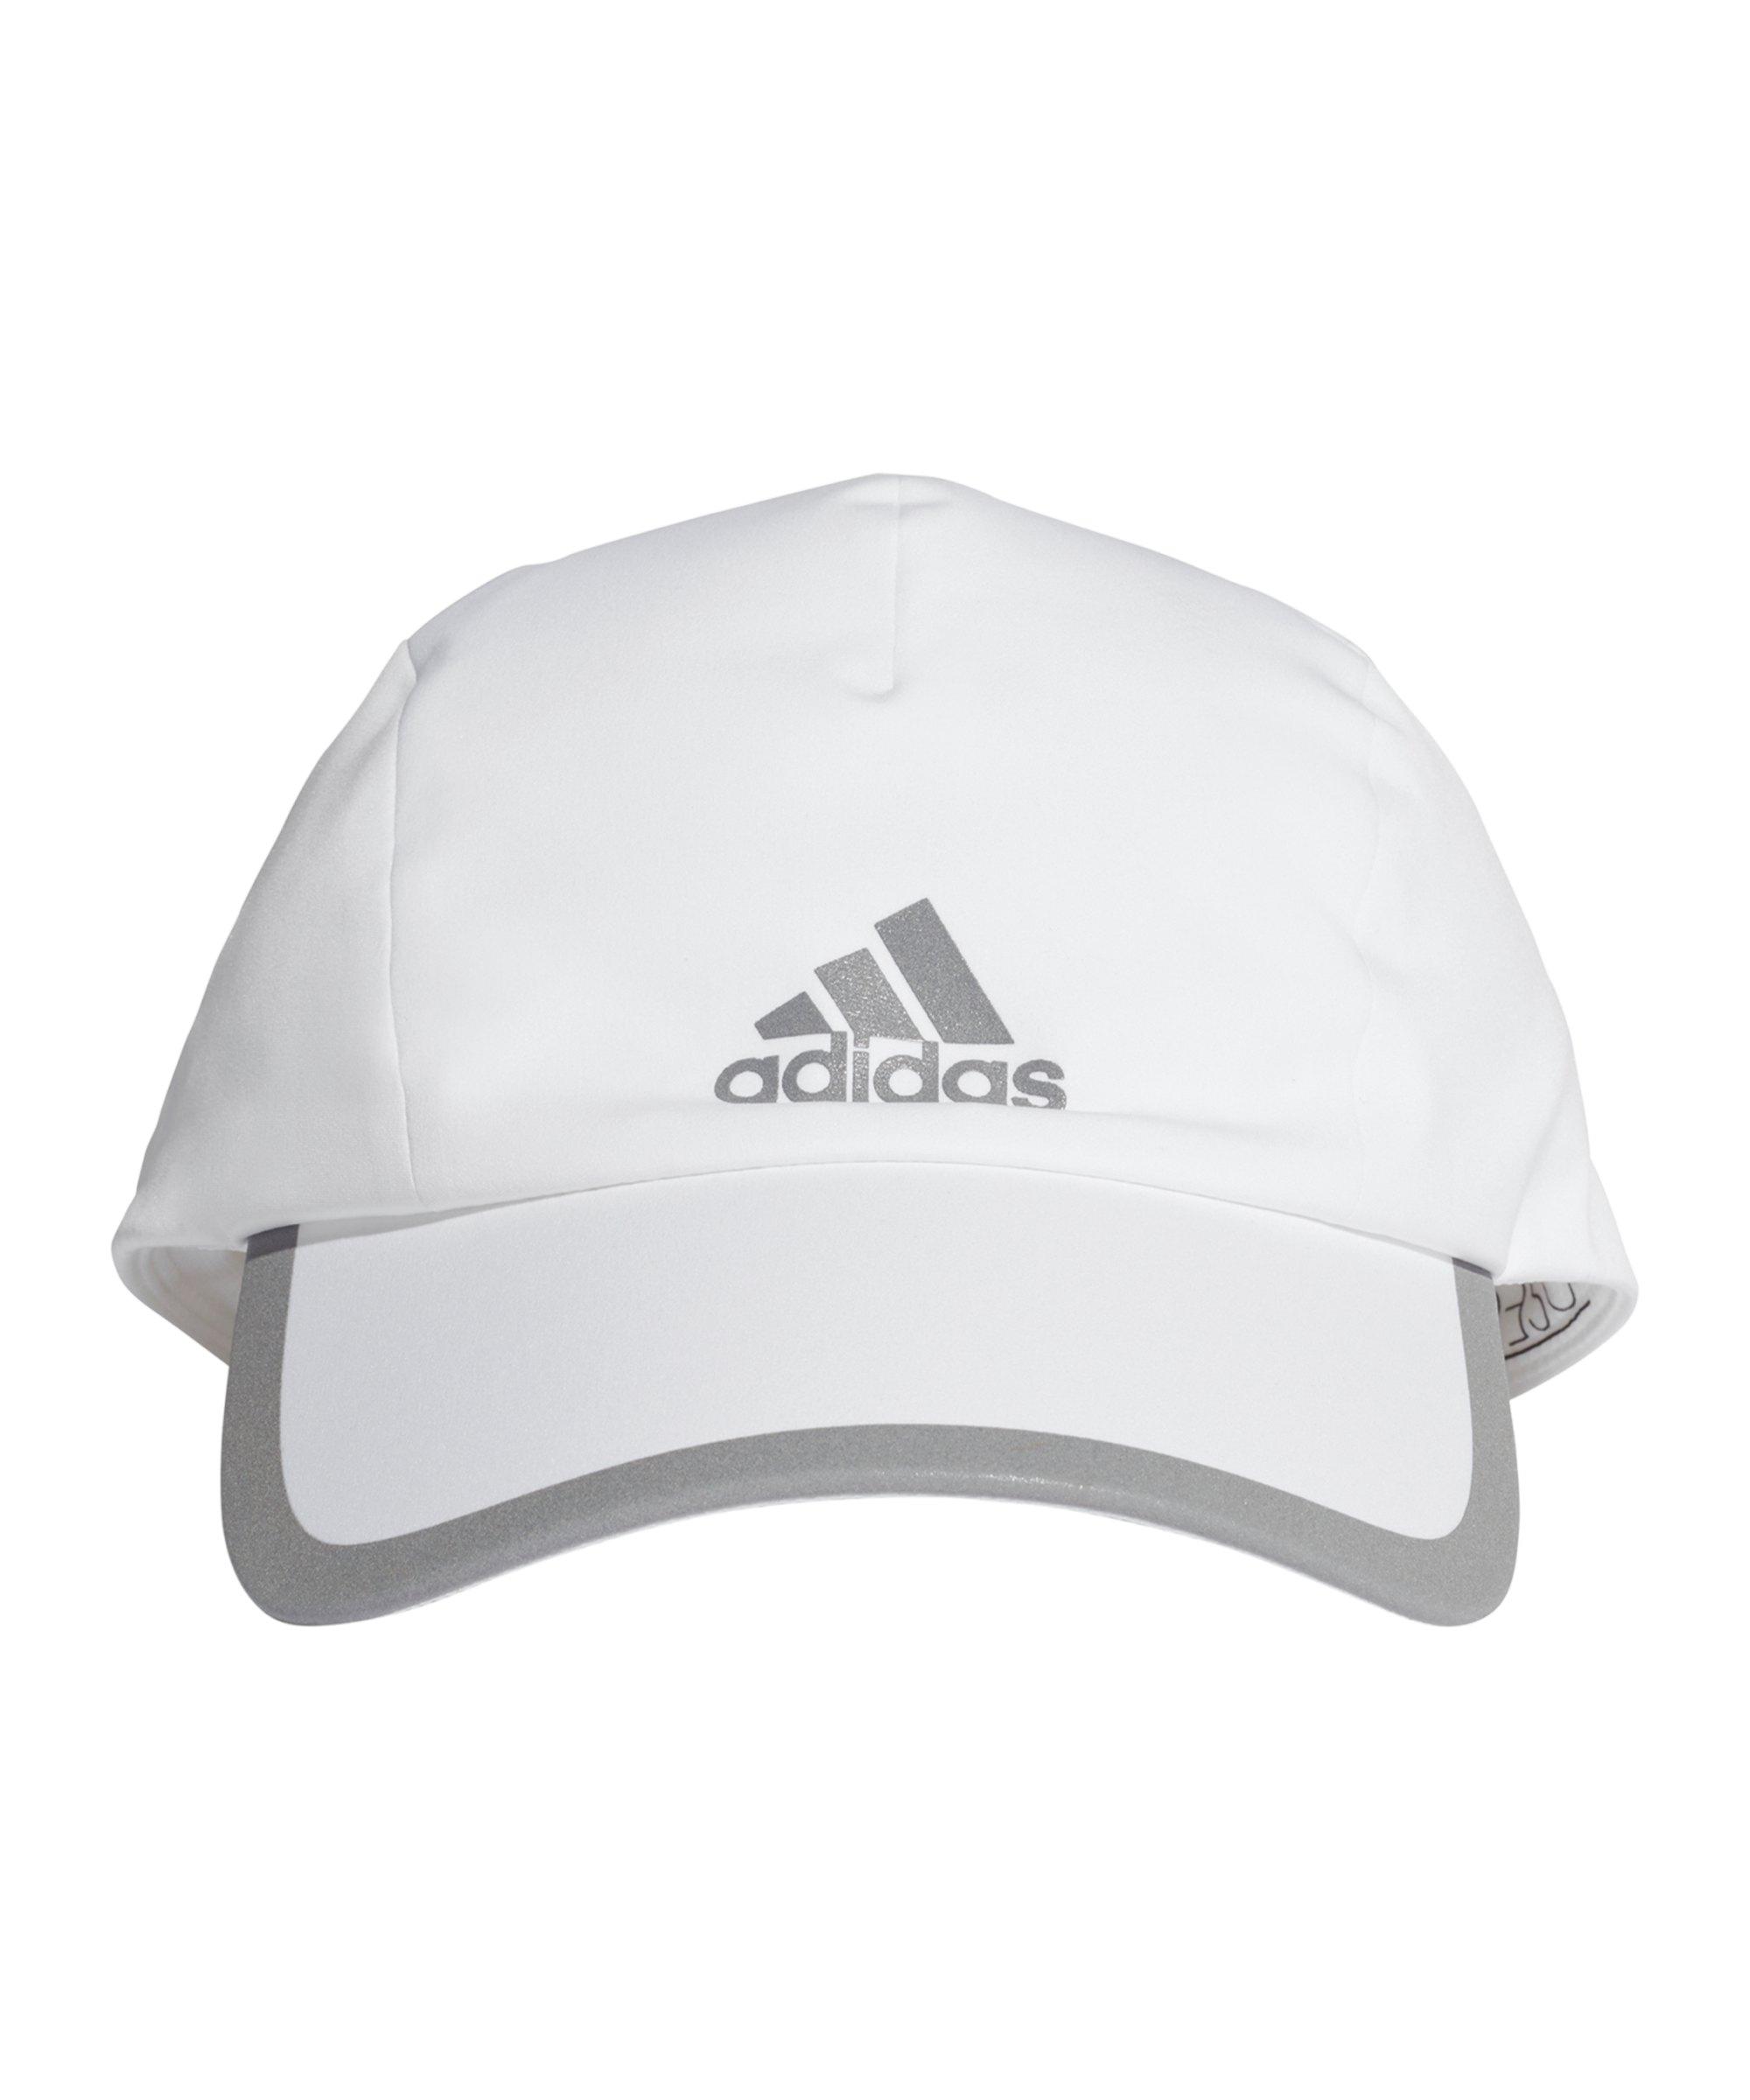 adidas Run Bonded Cap Weiß Grau - weiss